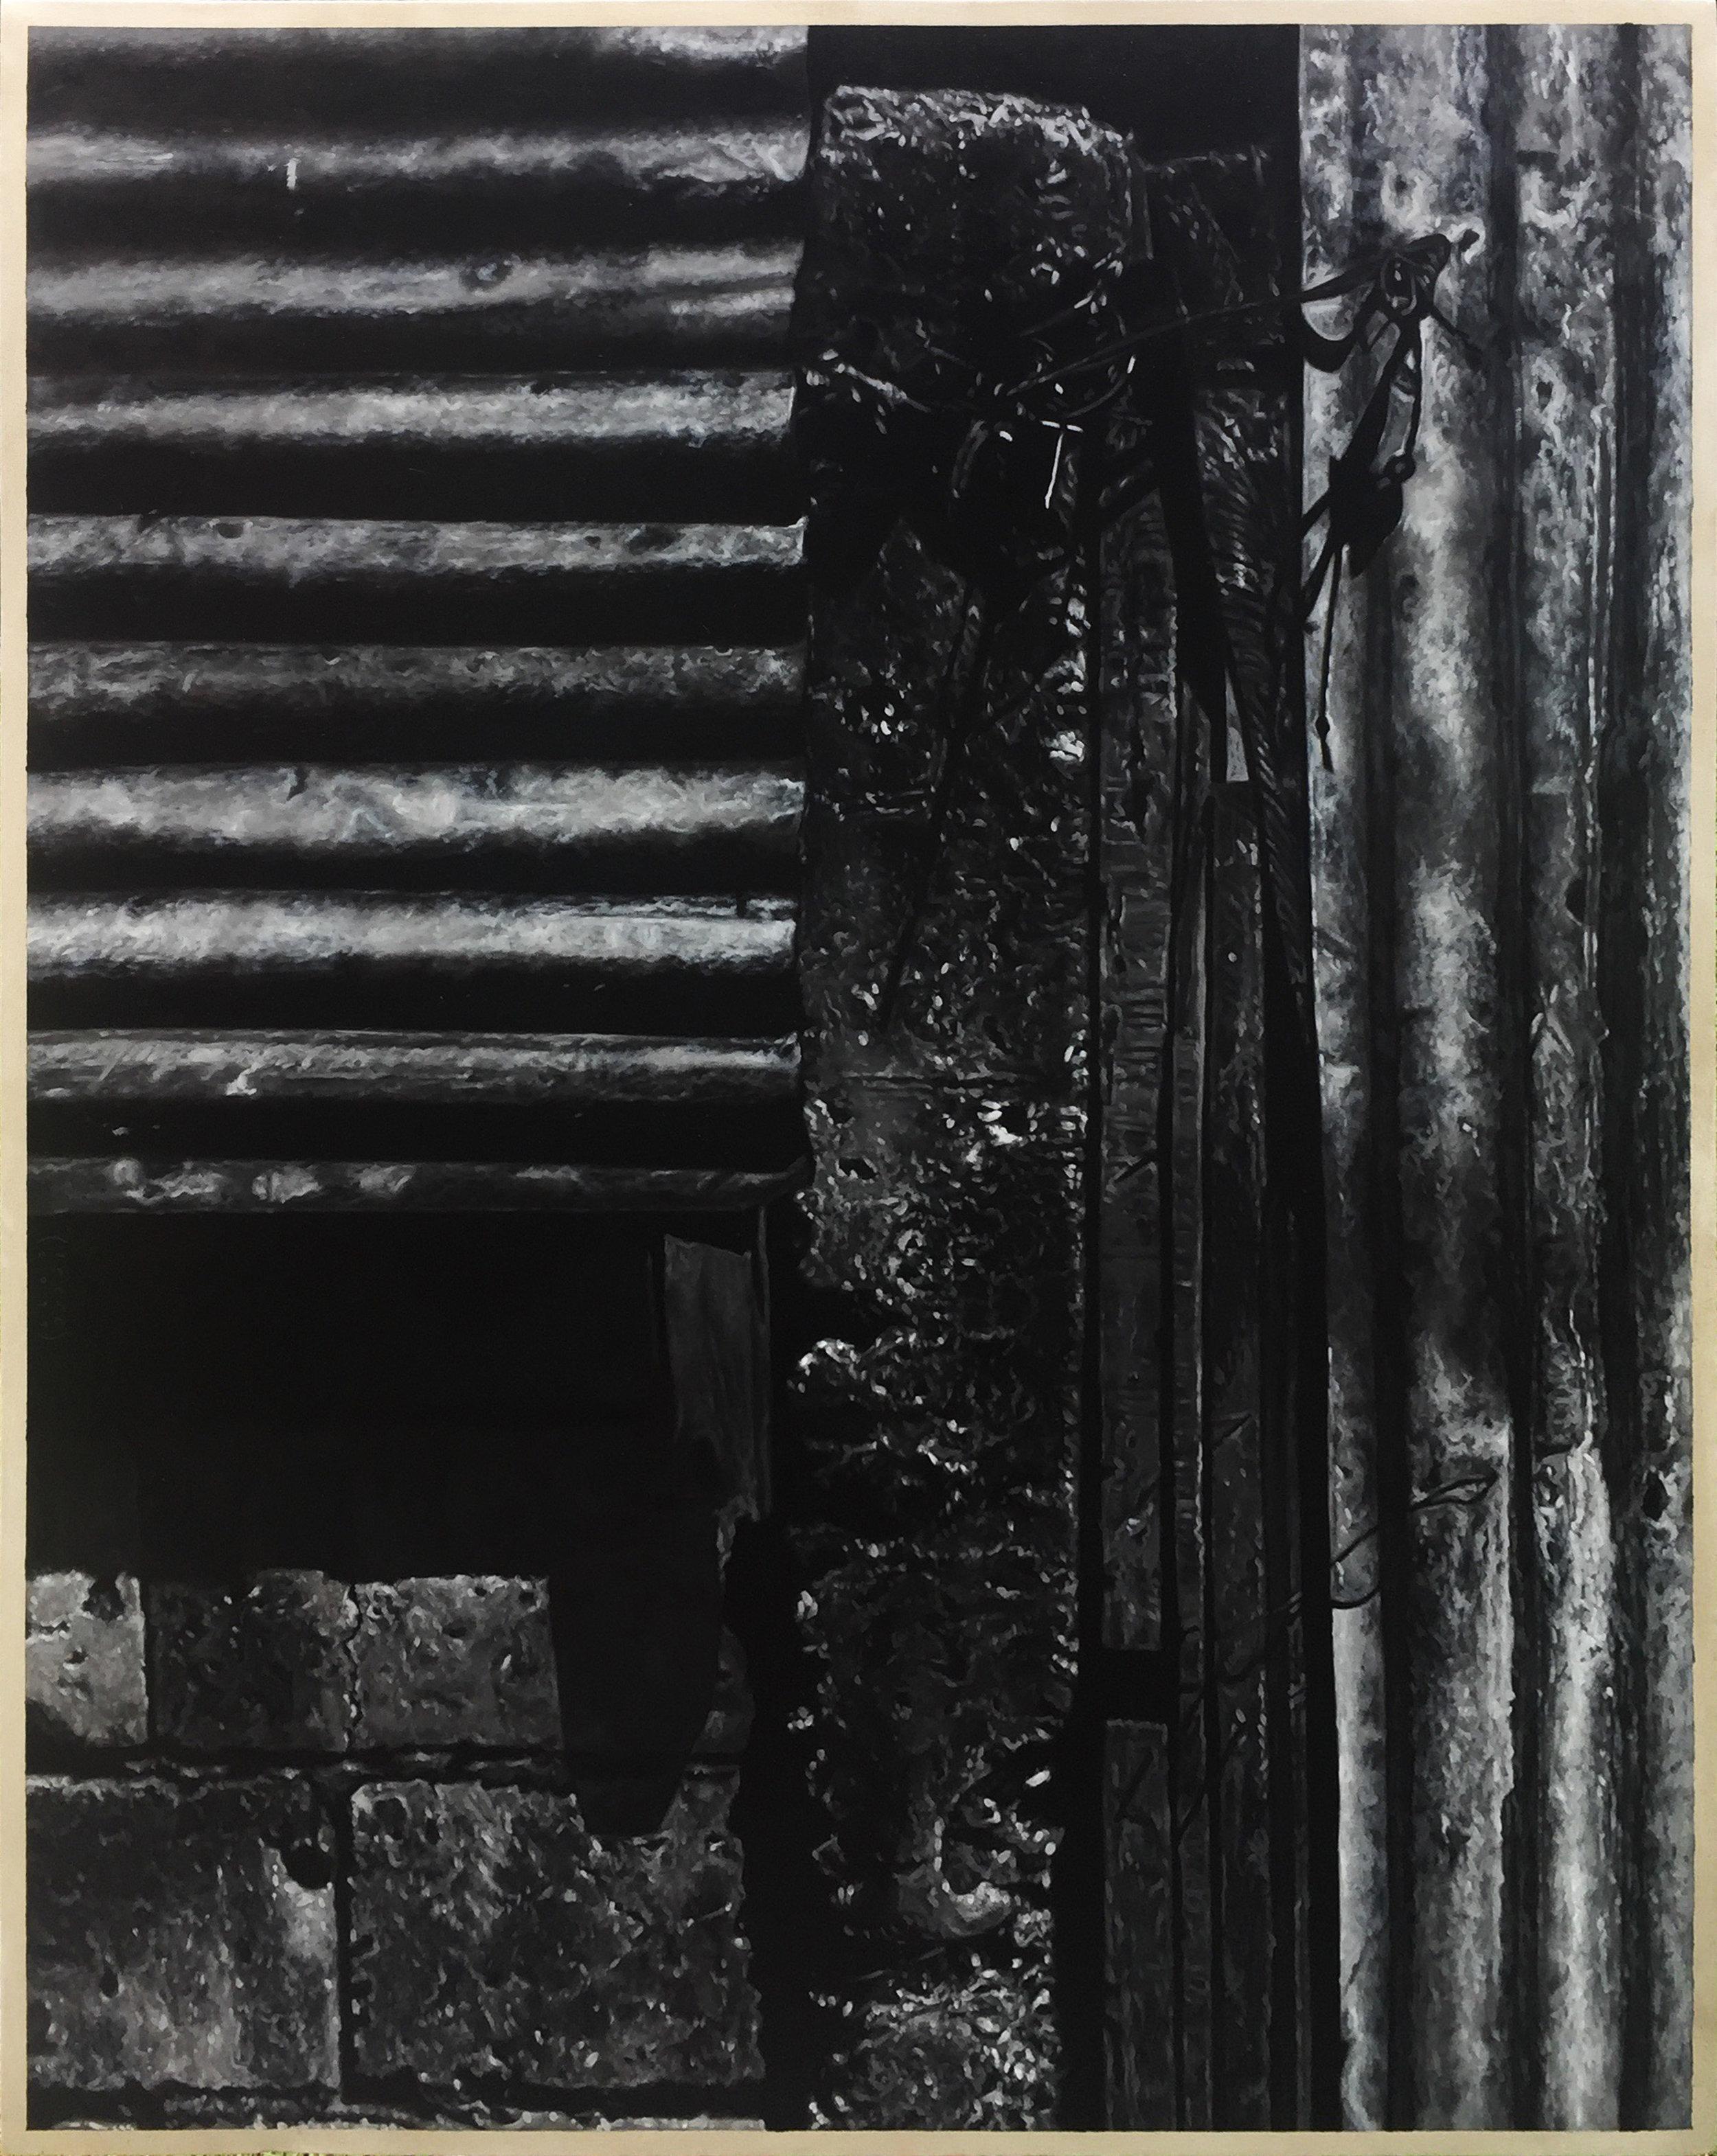 席康・森尼斯 _ Ciron Señeres 〈開與關|Post that open and close〉,油彩於畫布|oil on canvas,152 cmx121 cm|59.5 in x 47.6 in,2019.jpg